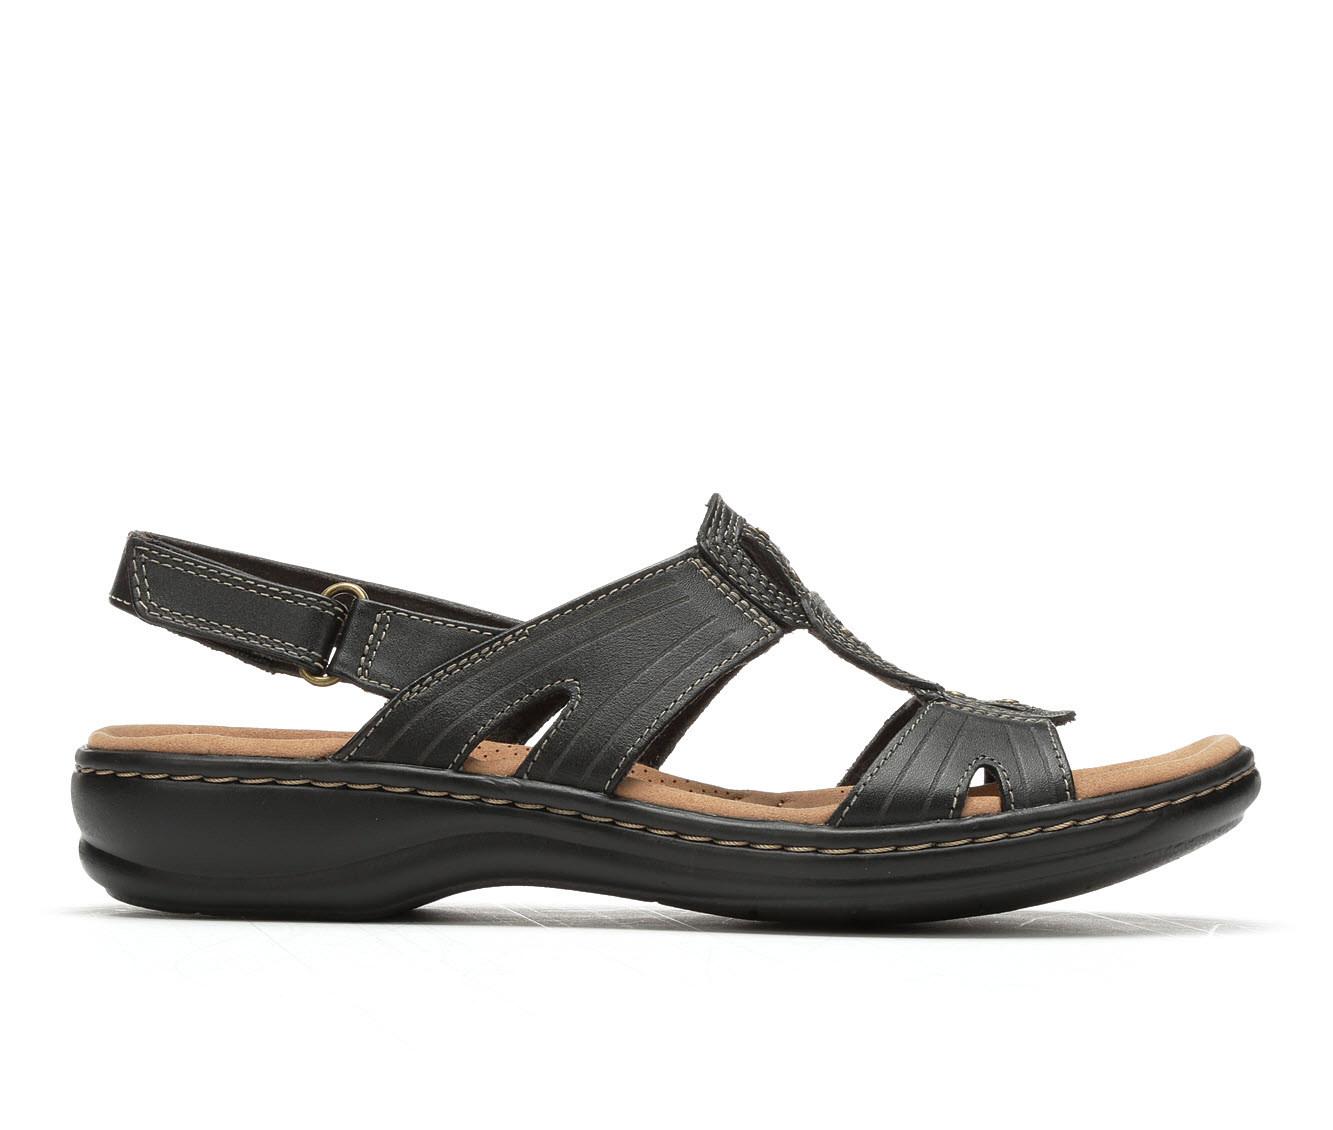 Women's Clarks Leisa Vine Sandals (Black)